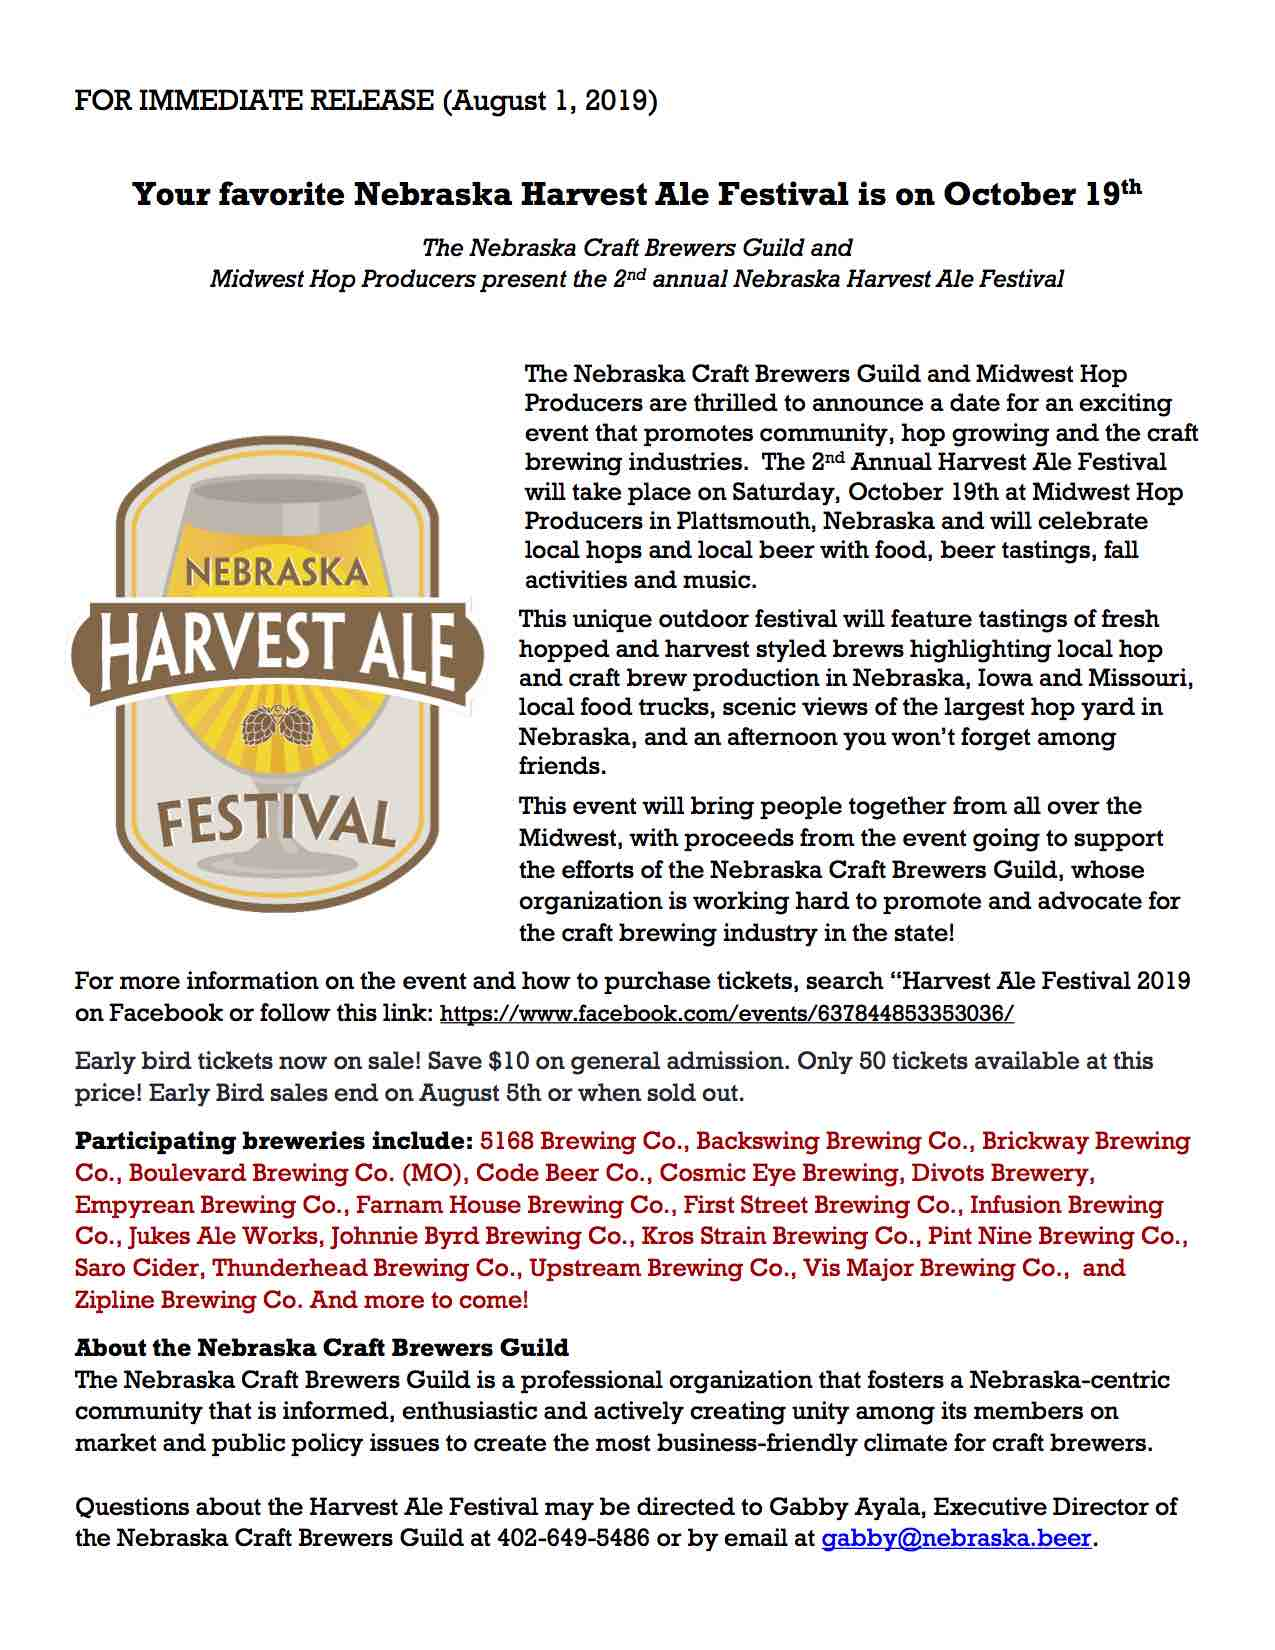 Harvest Ale 2019 Press Release 8.1.2019